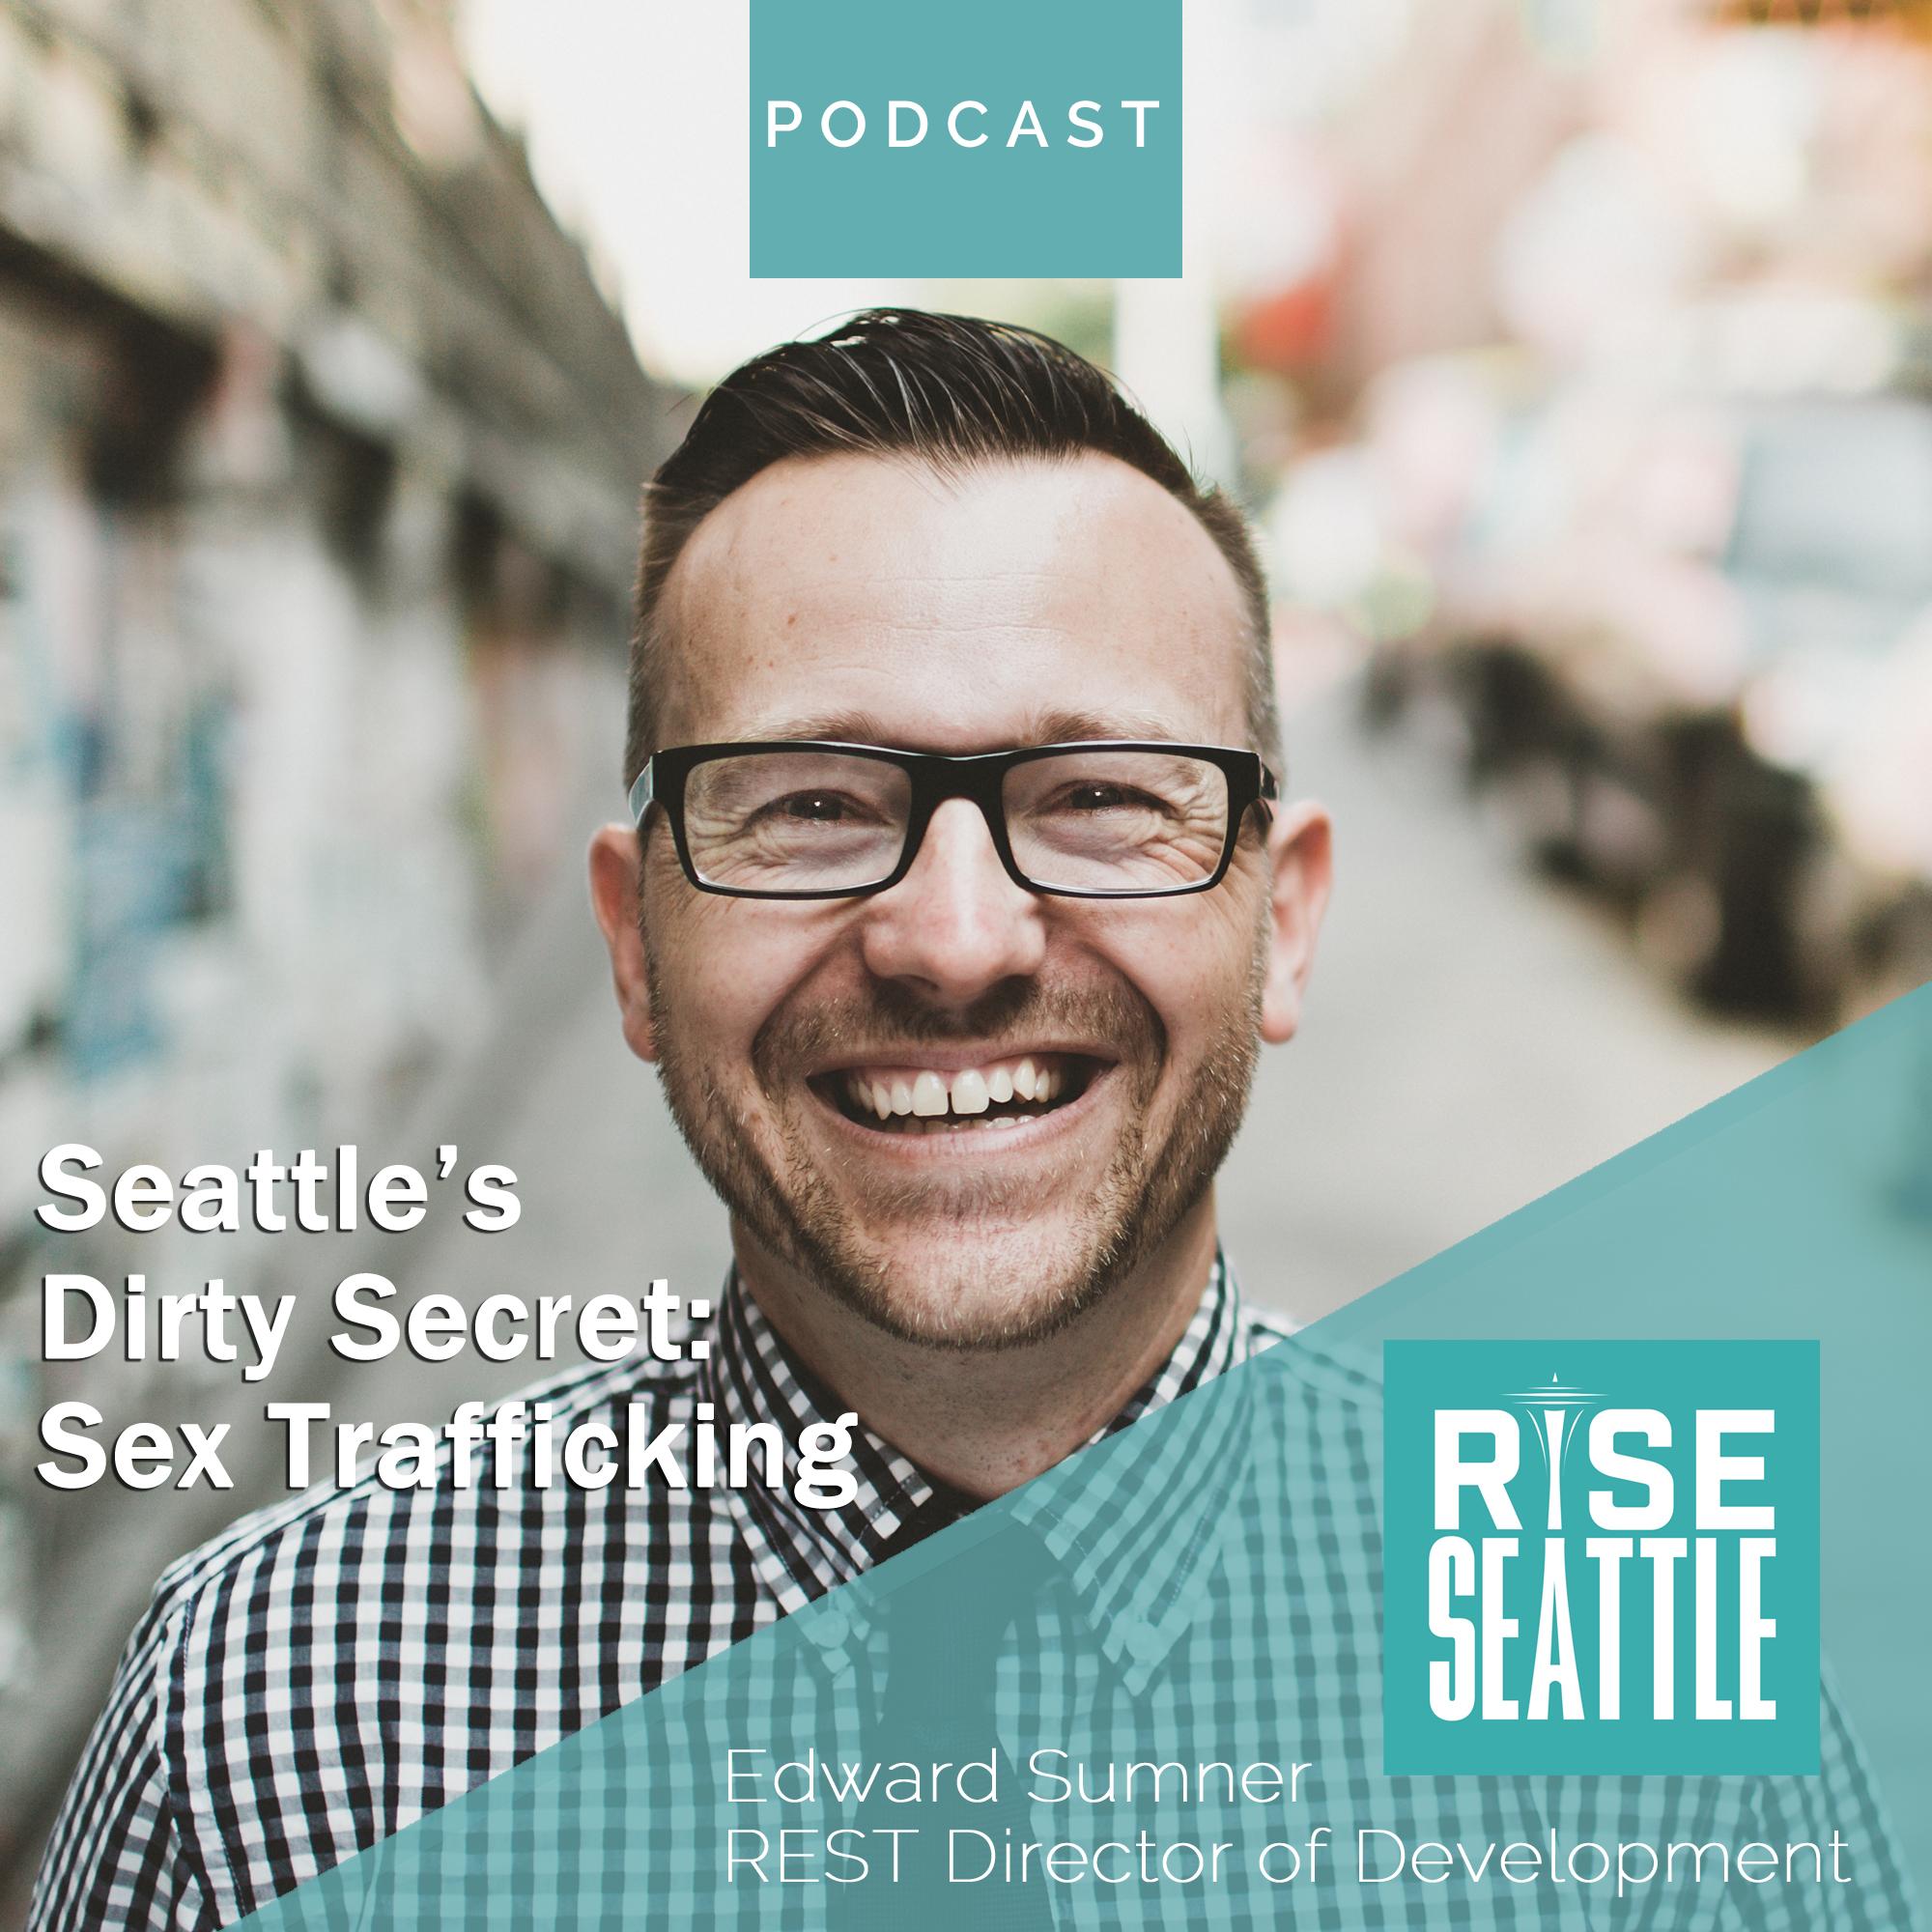 S1.E4. Edward Sumner on Seattle's Dark Secret: Sex Trafficking